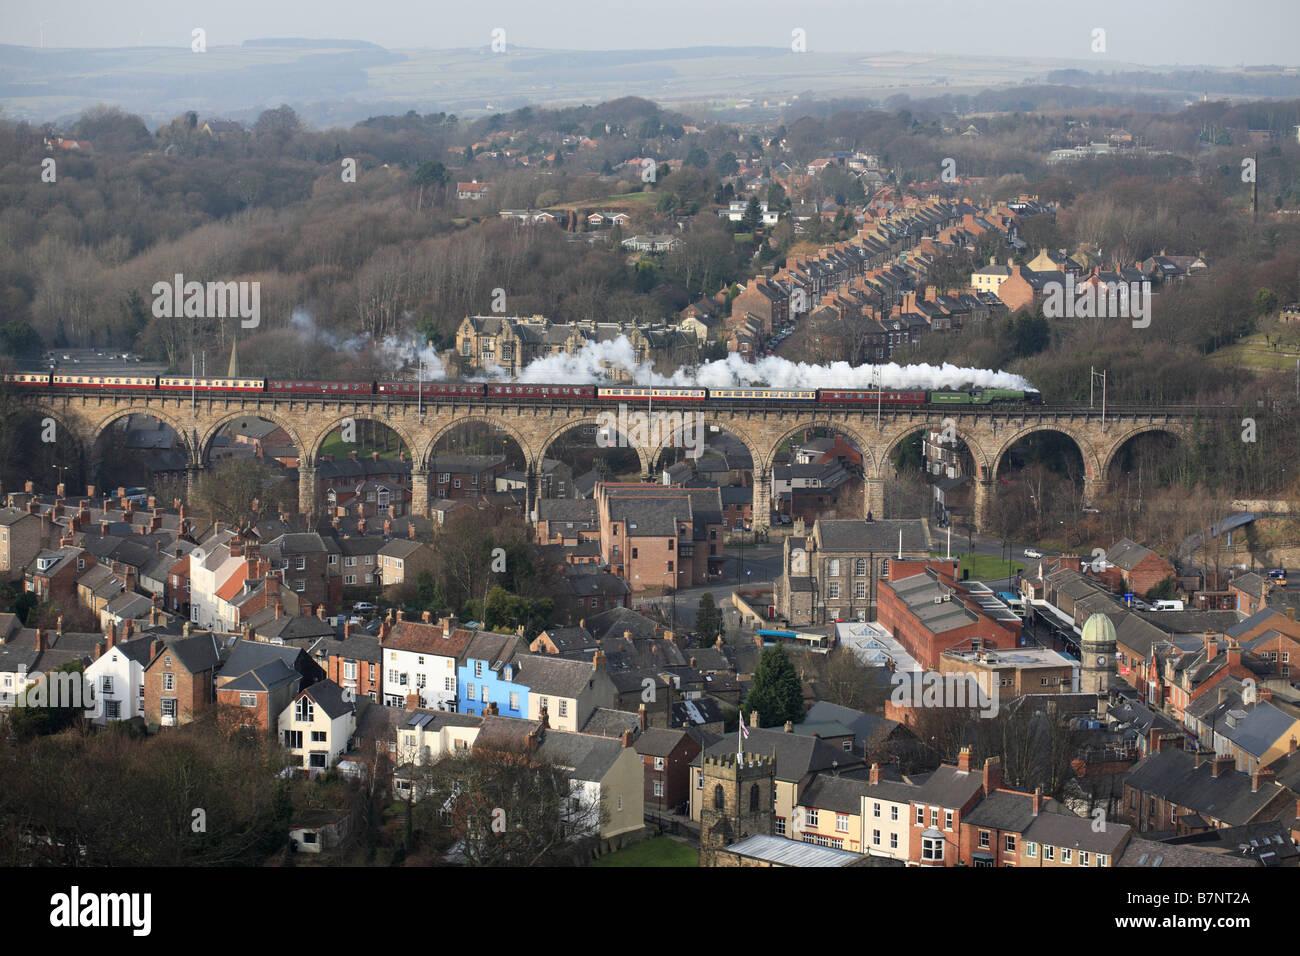 Steam loco 60163 Tornado crossing Durham Viaduct, England, UK - Stock Image